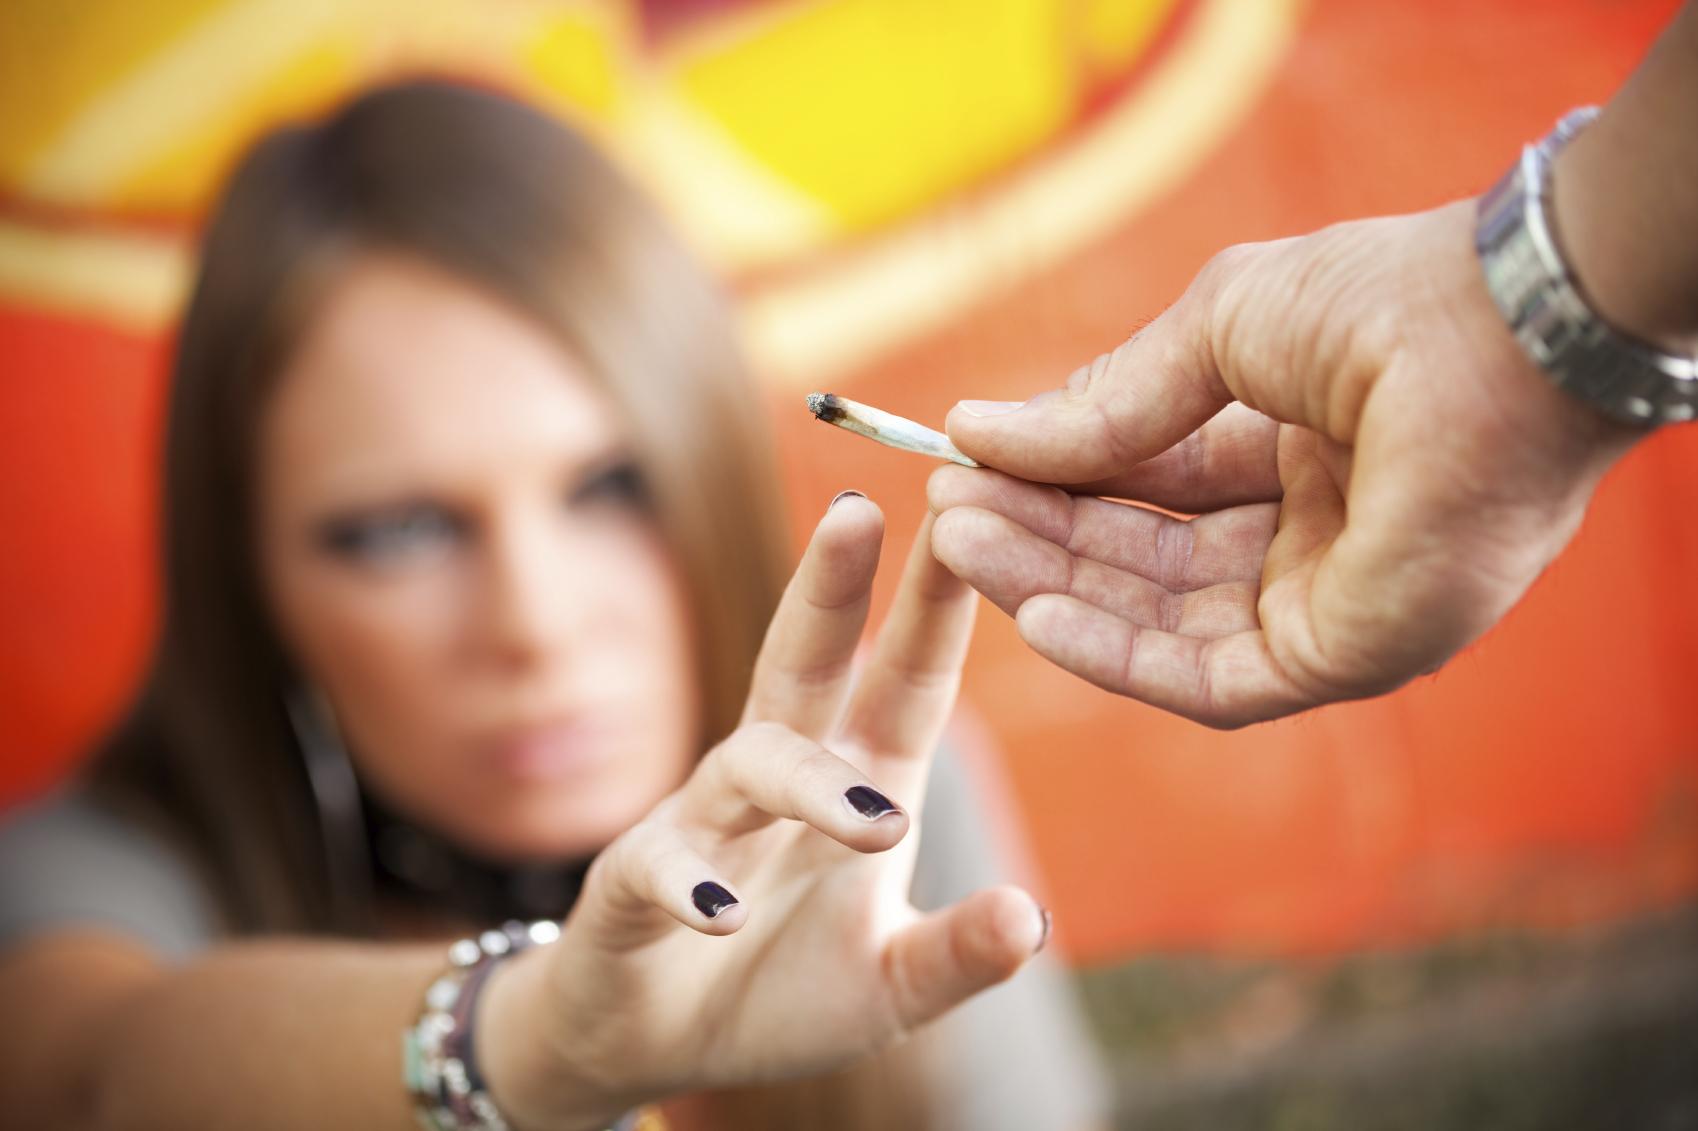 Drug use and perception survey for dissertation?